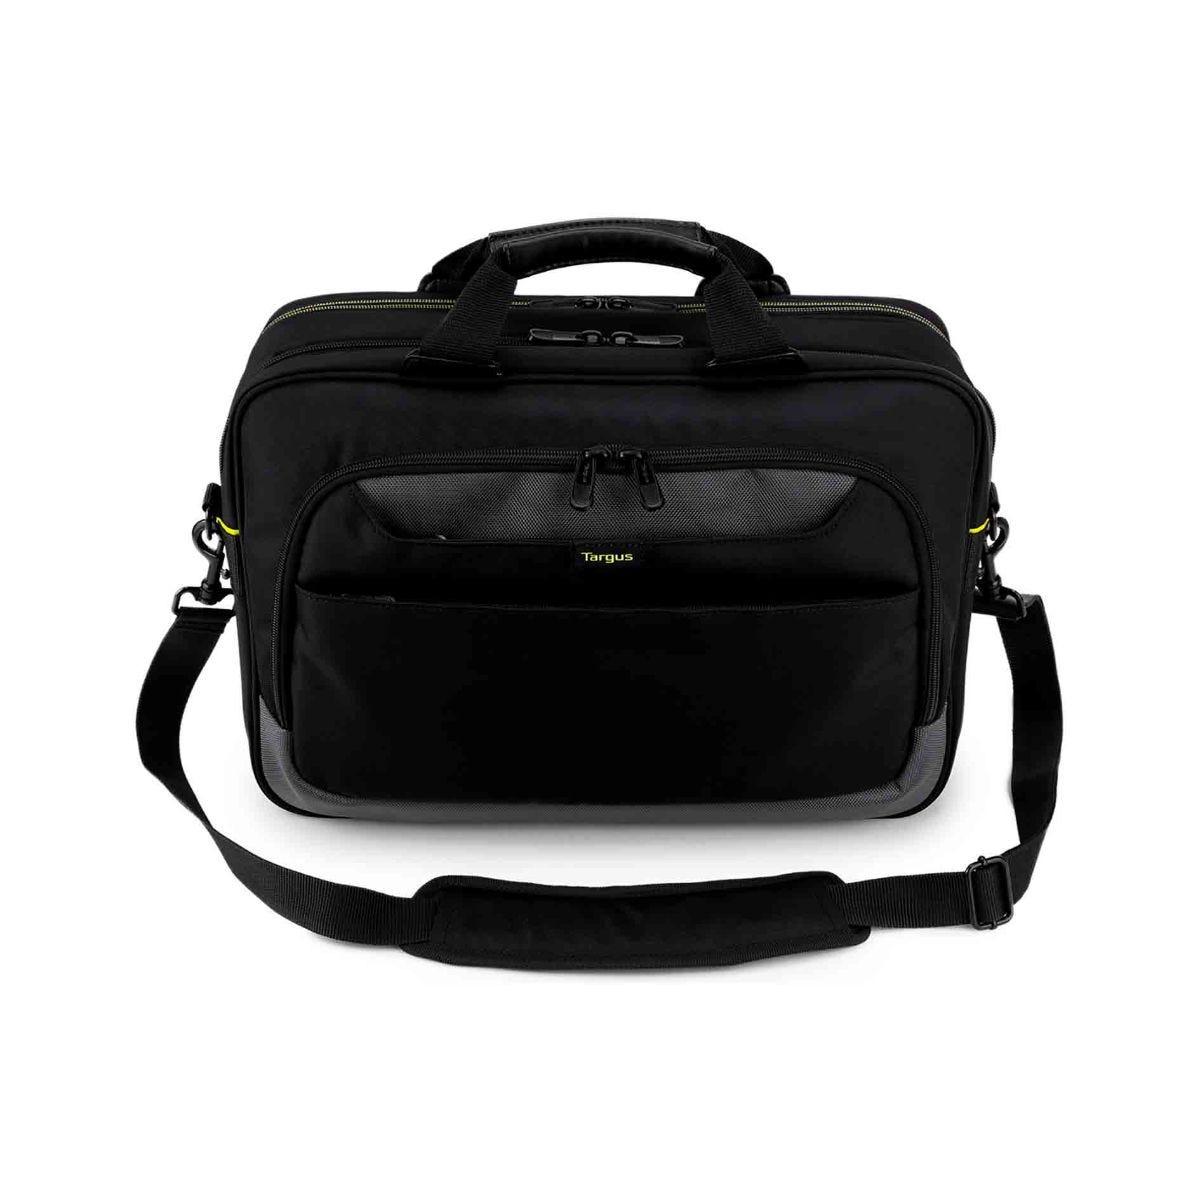 Image of Targus CityGear Topload Laptop Case 12-14 Inch Black, Black